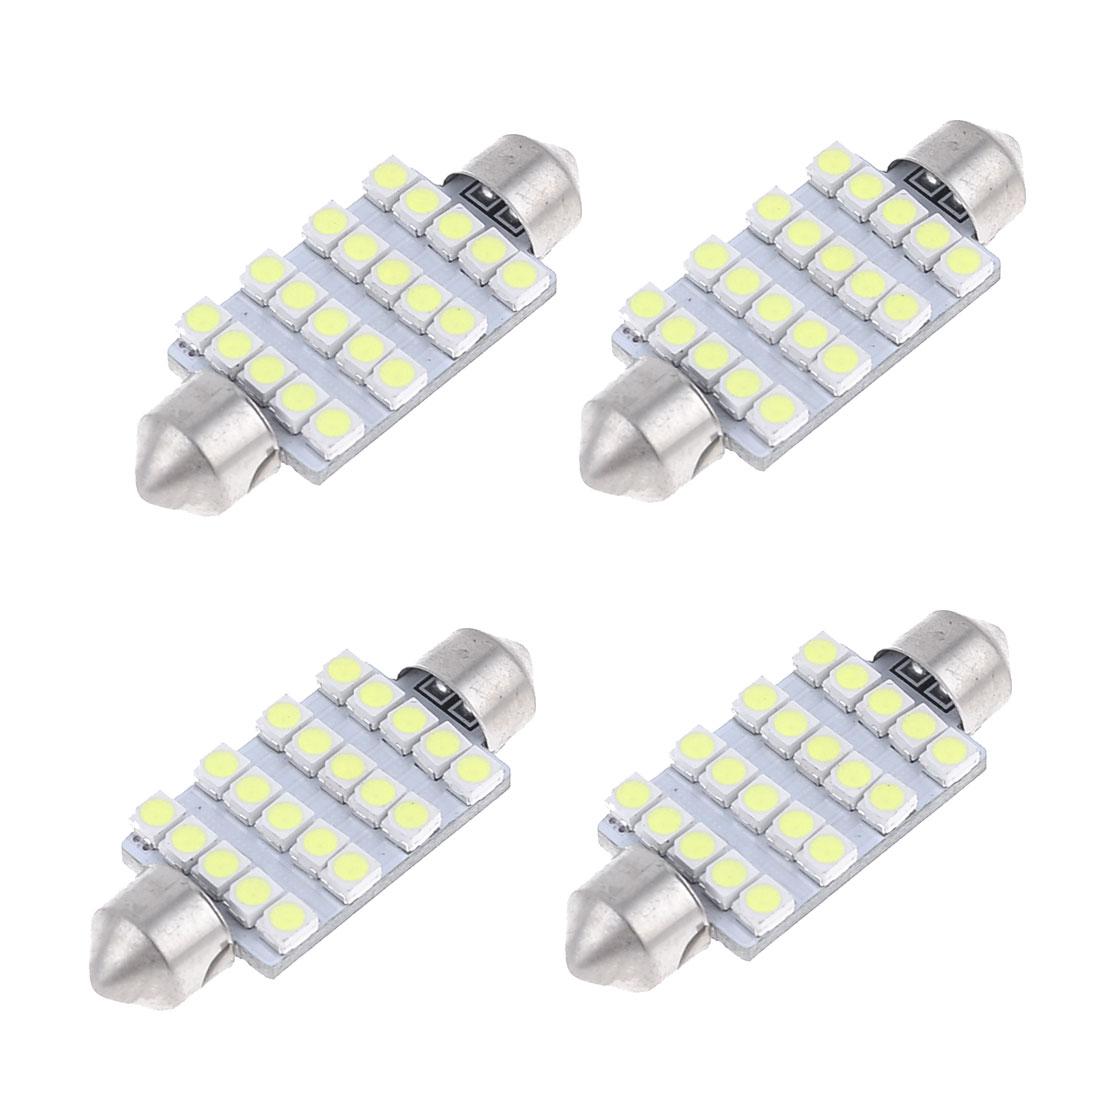 4pcs 41mm 3528 1210 SMD 20-LED Festoon Dome Light Bulb White 6413 211-2 212-2